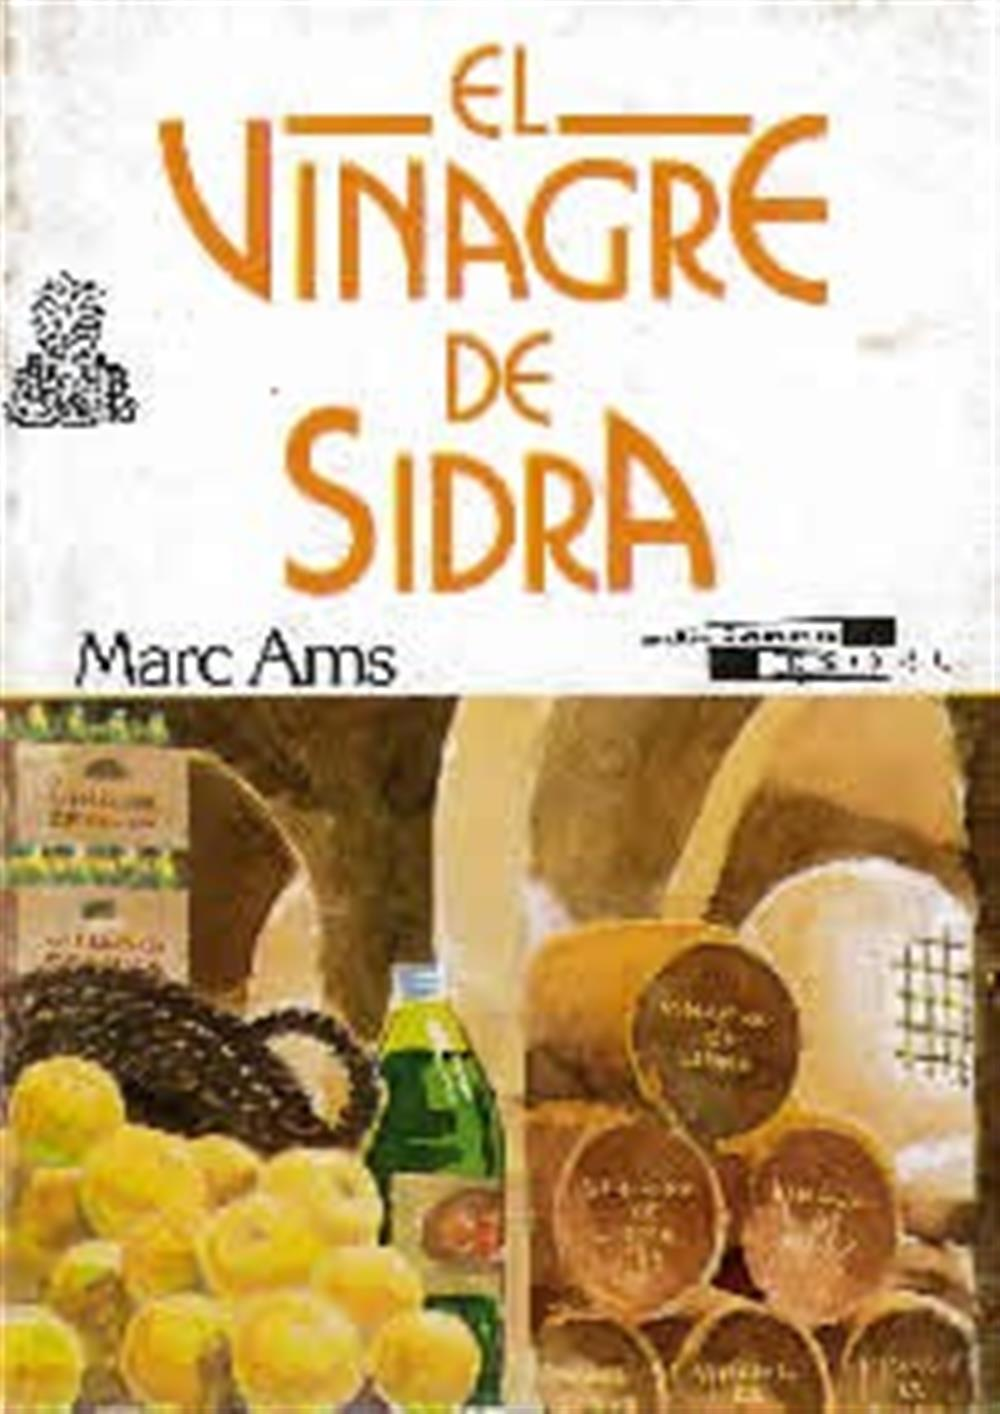 El Vinagre de Sidra